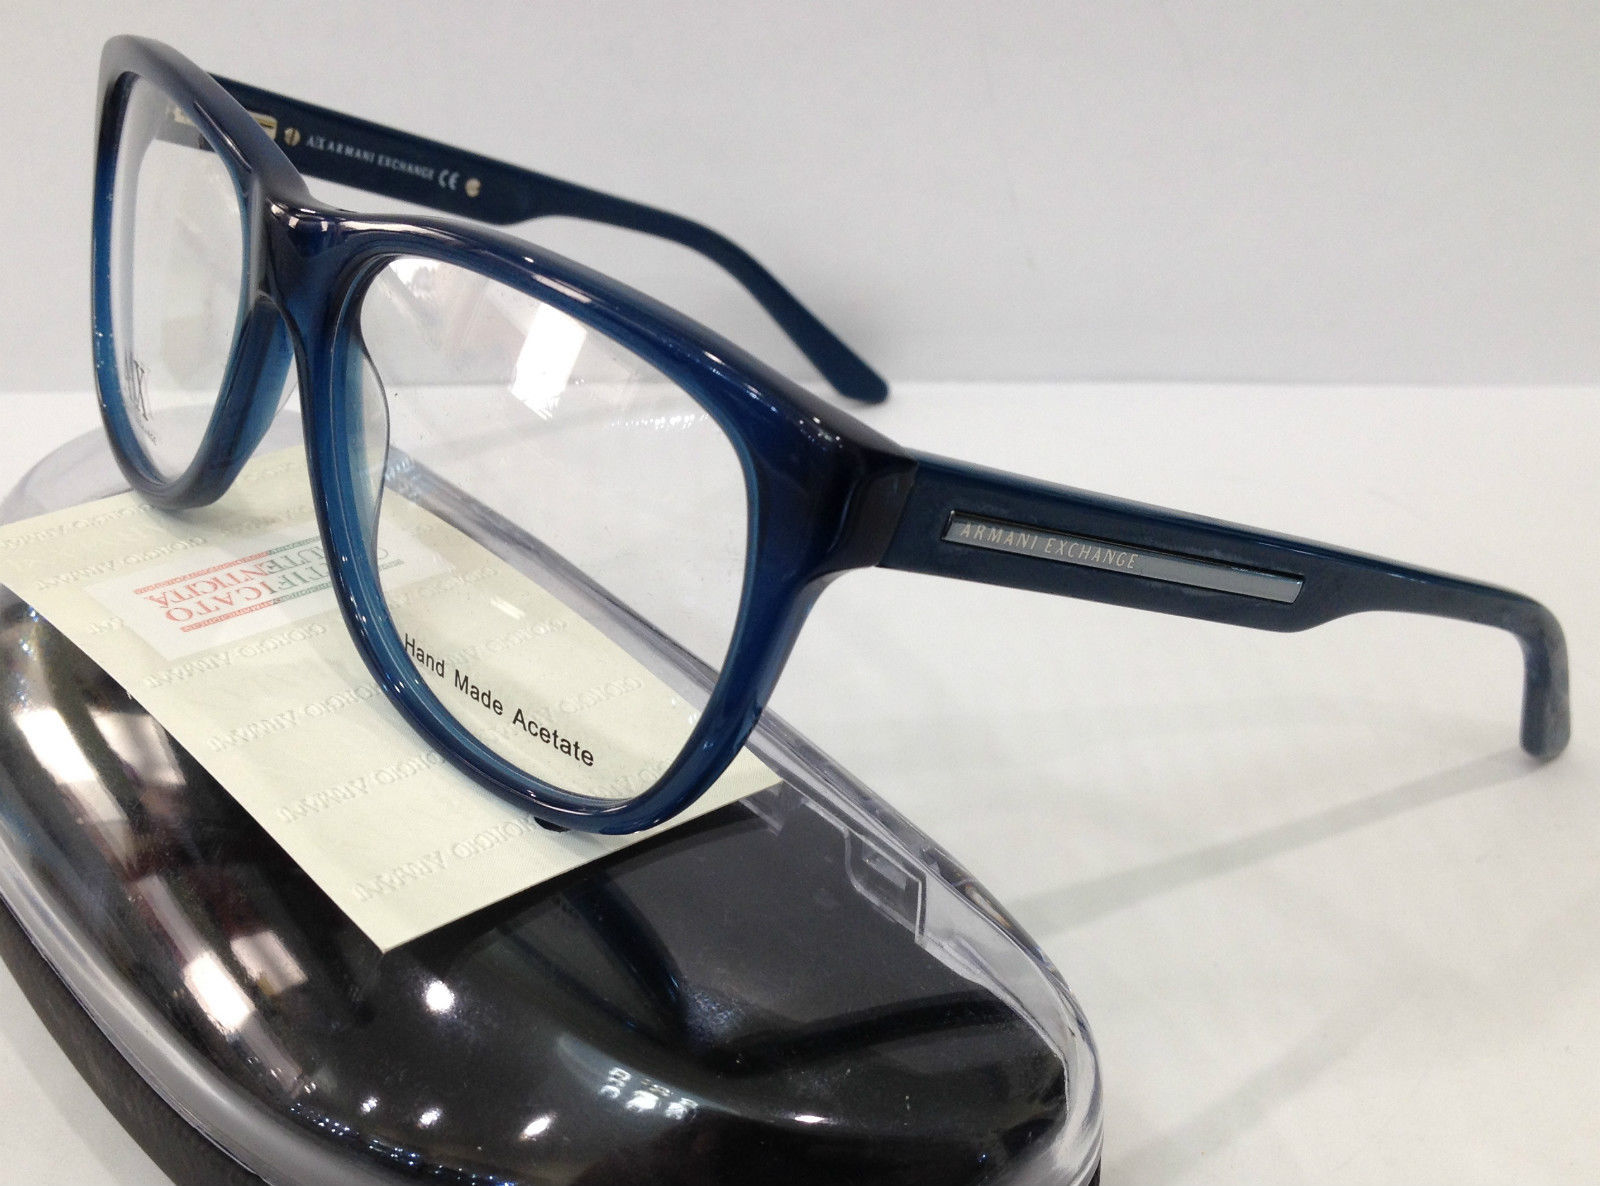 Big Blue Glasses Frames : NEW ARMANI EXCHANGE AX237 COLOR BBO BLUE BIG PLASTIC ...